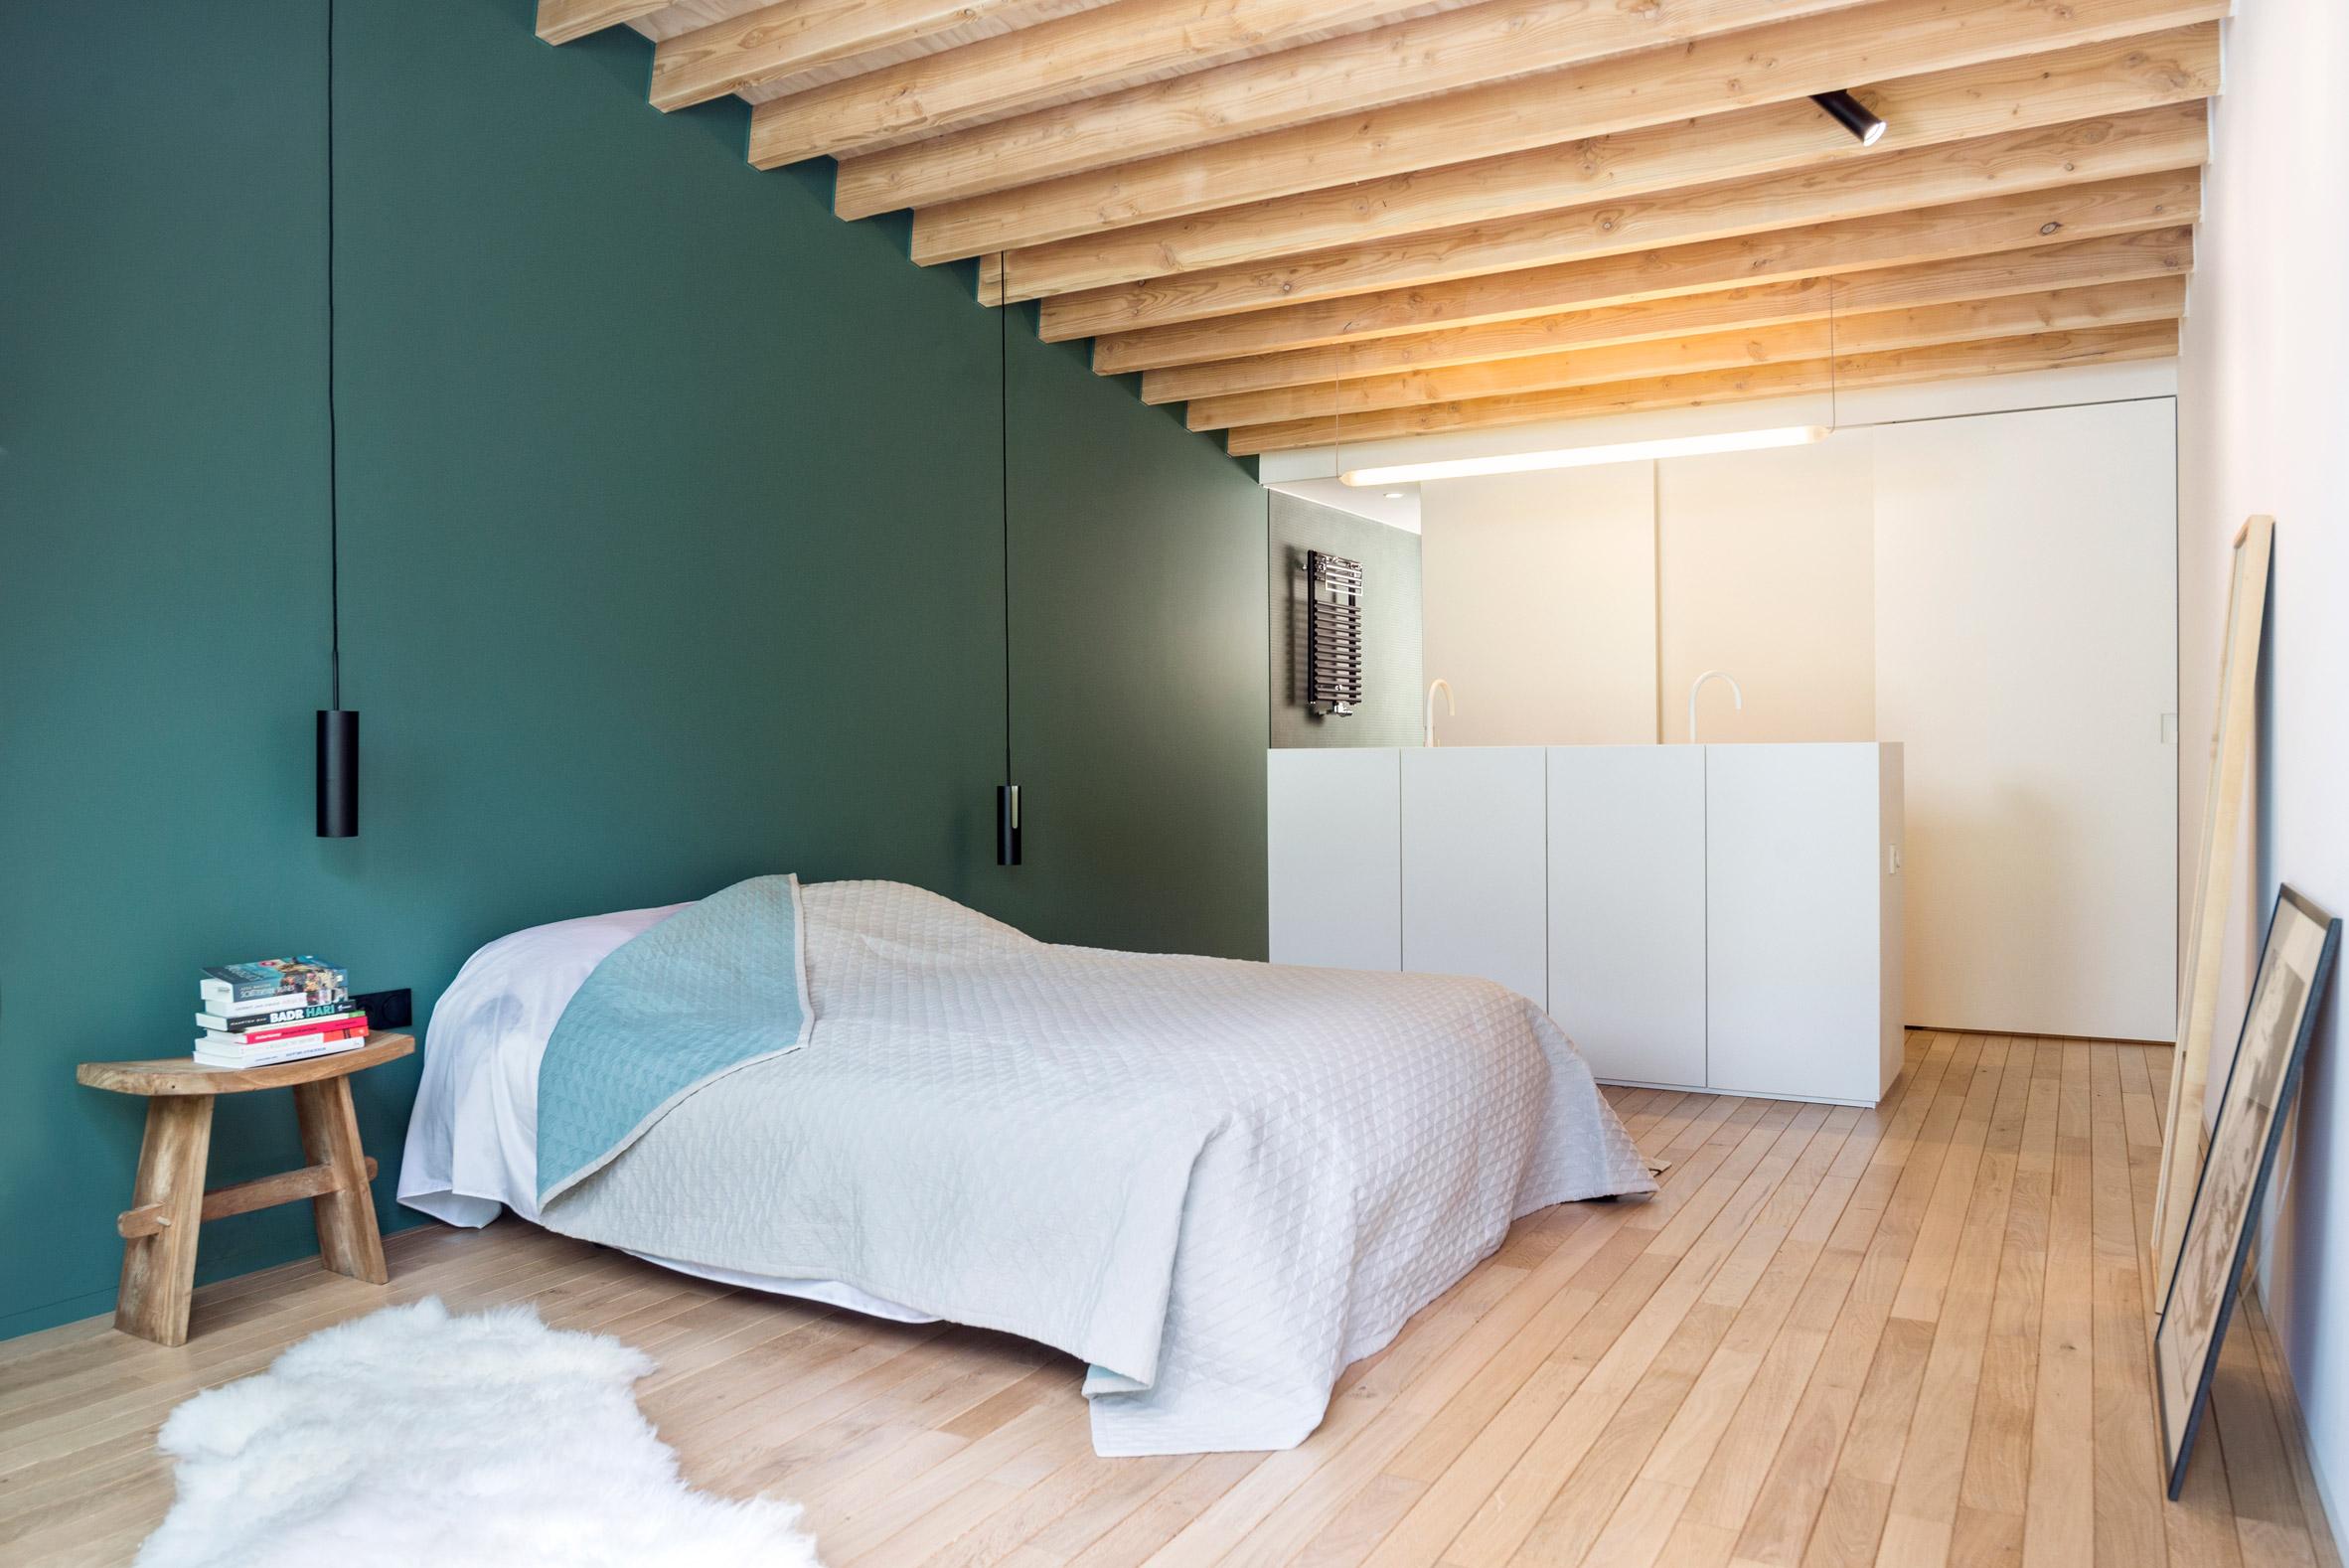 architecture-semi-detached-house-with-an-outdoor-areadesign-studia-interiors-osnovadesign-osnova-poltava_09